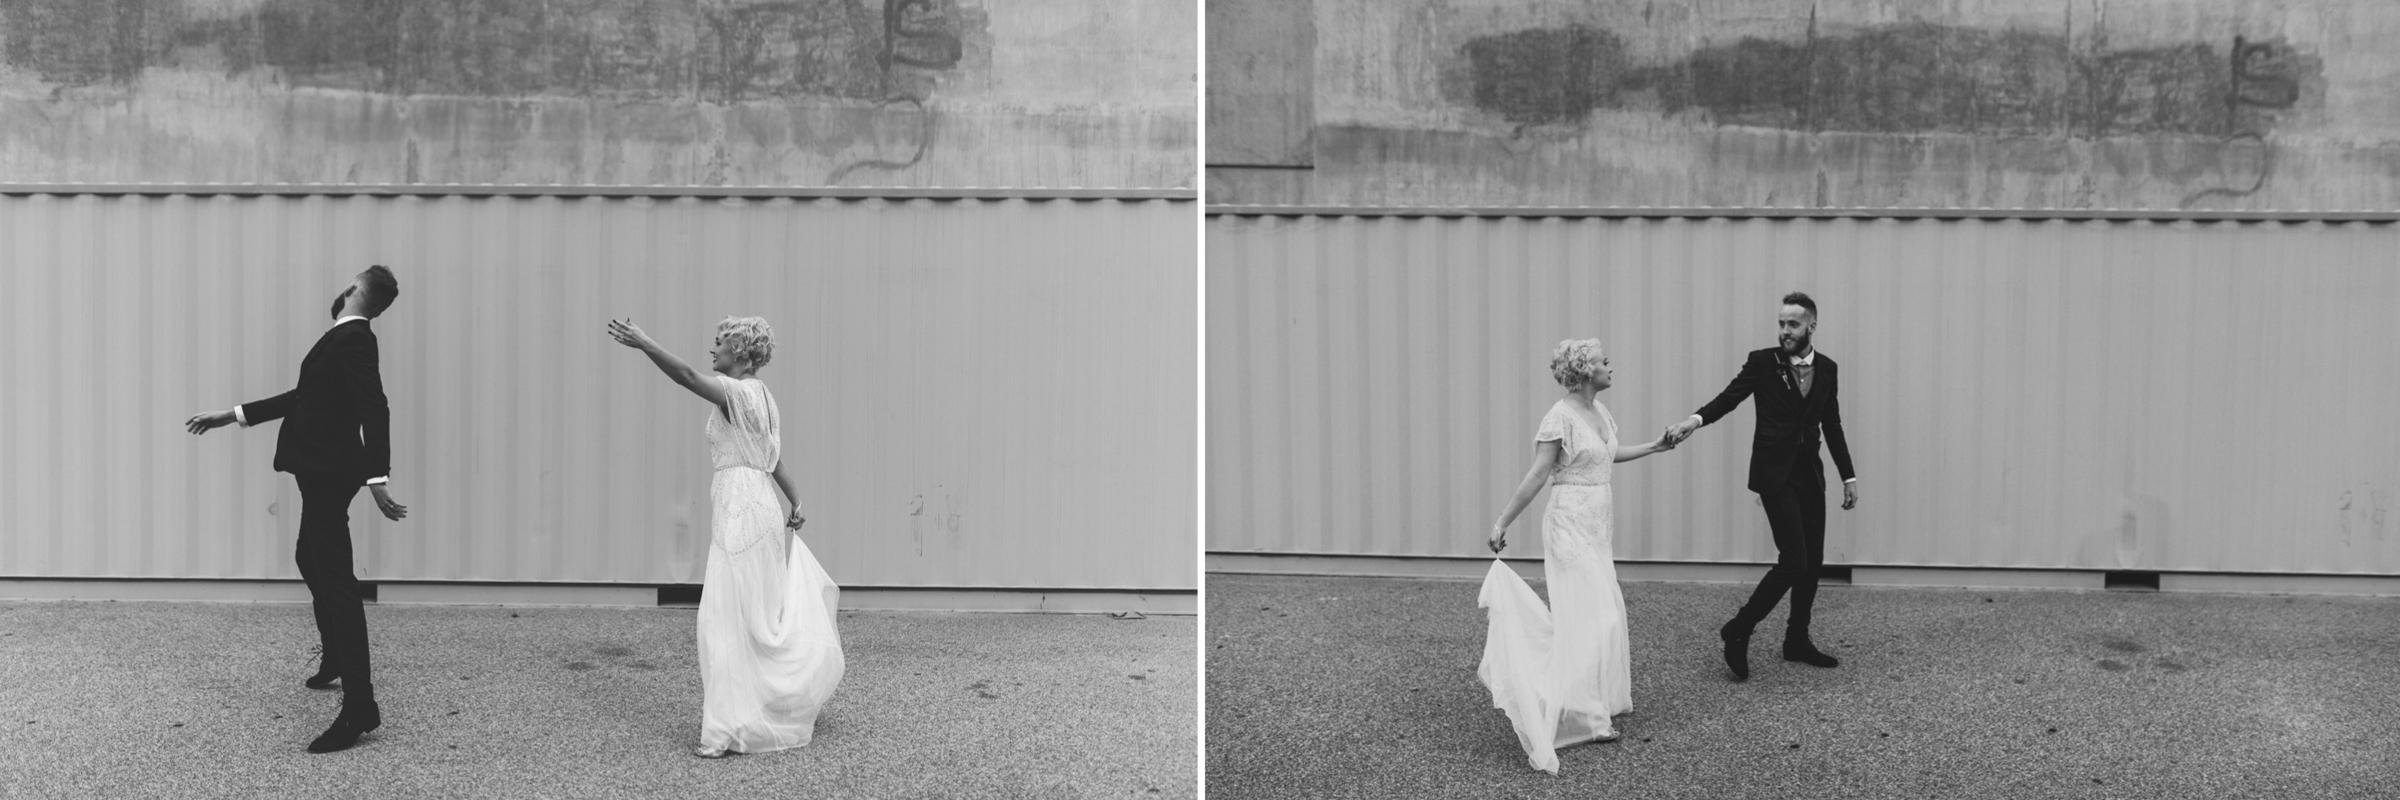 ©Isaiah + Taylor Photography - Studio 11 Wedding, Los Angeles Wedding Photographer-145.jpg